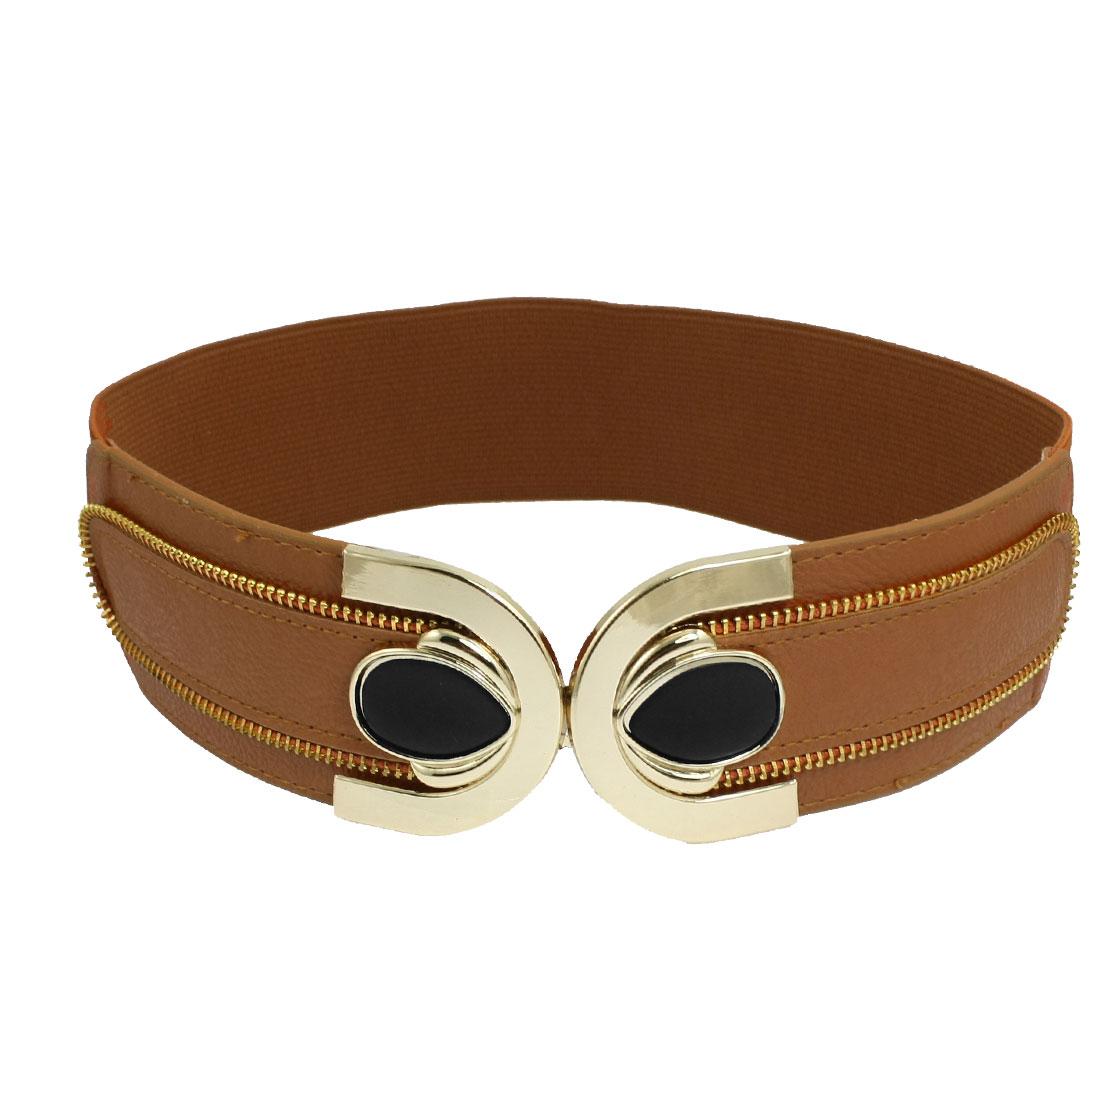 Women Rhinestone Decor Interlocking Buckle Elastic Waist Belt Cinch Brown